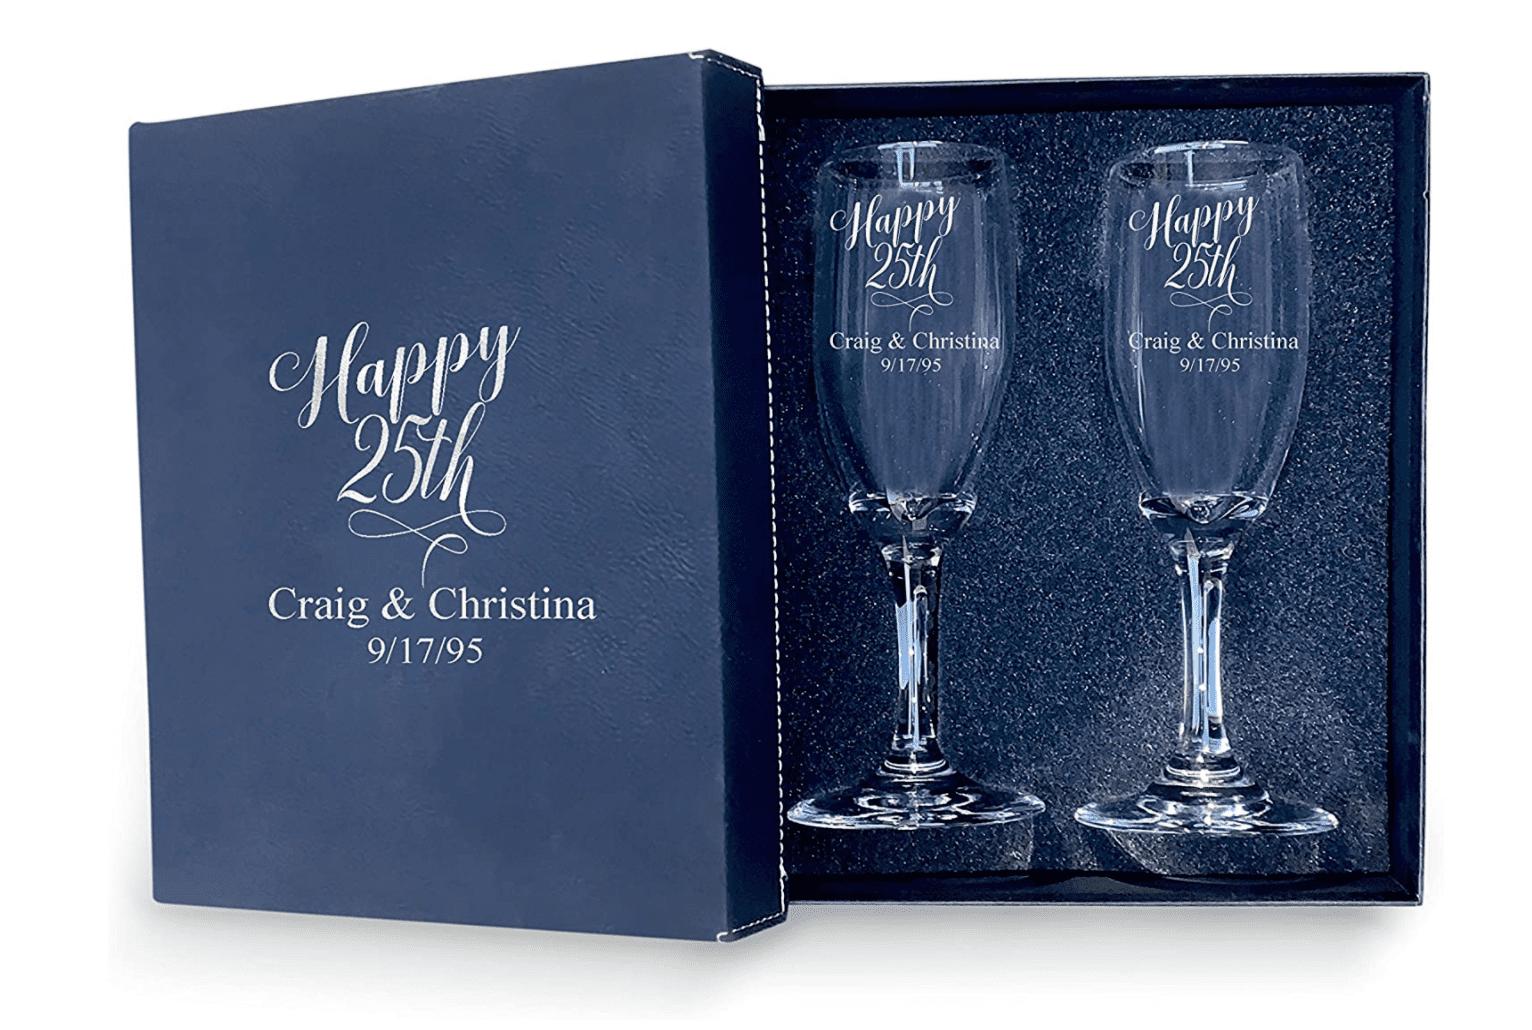 25th Anniversary Couple Champagne Glasses with Black Box